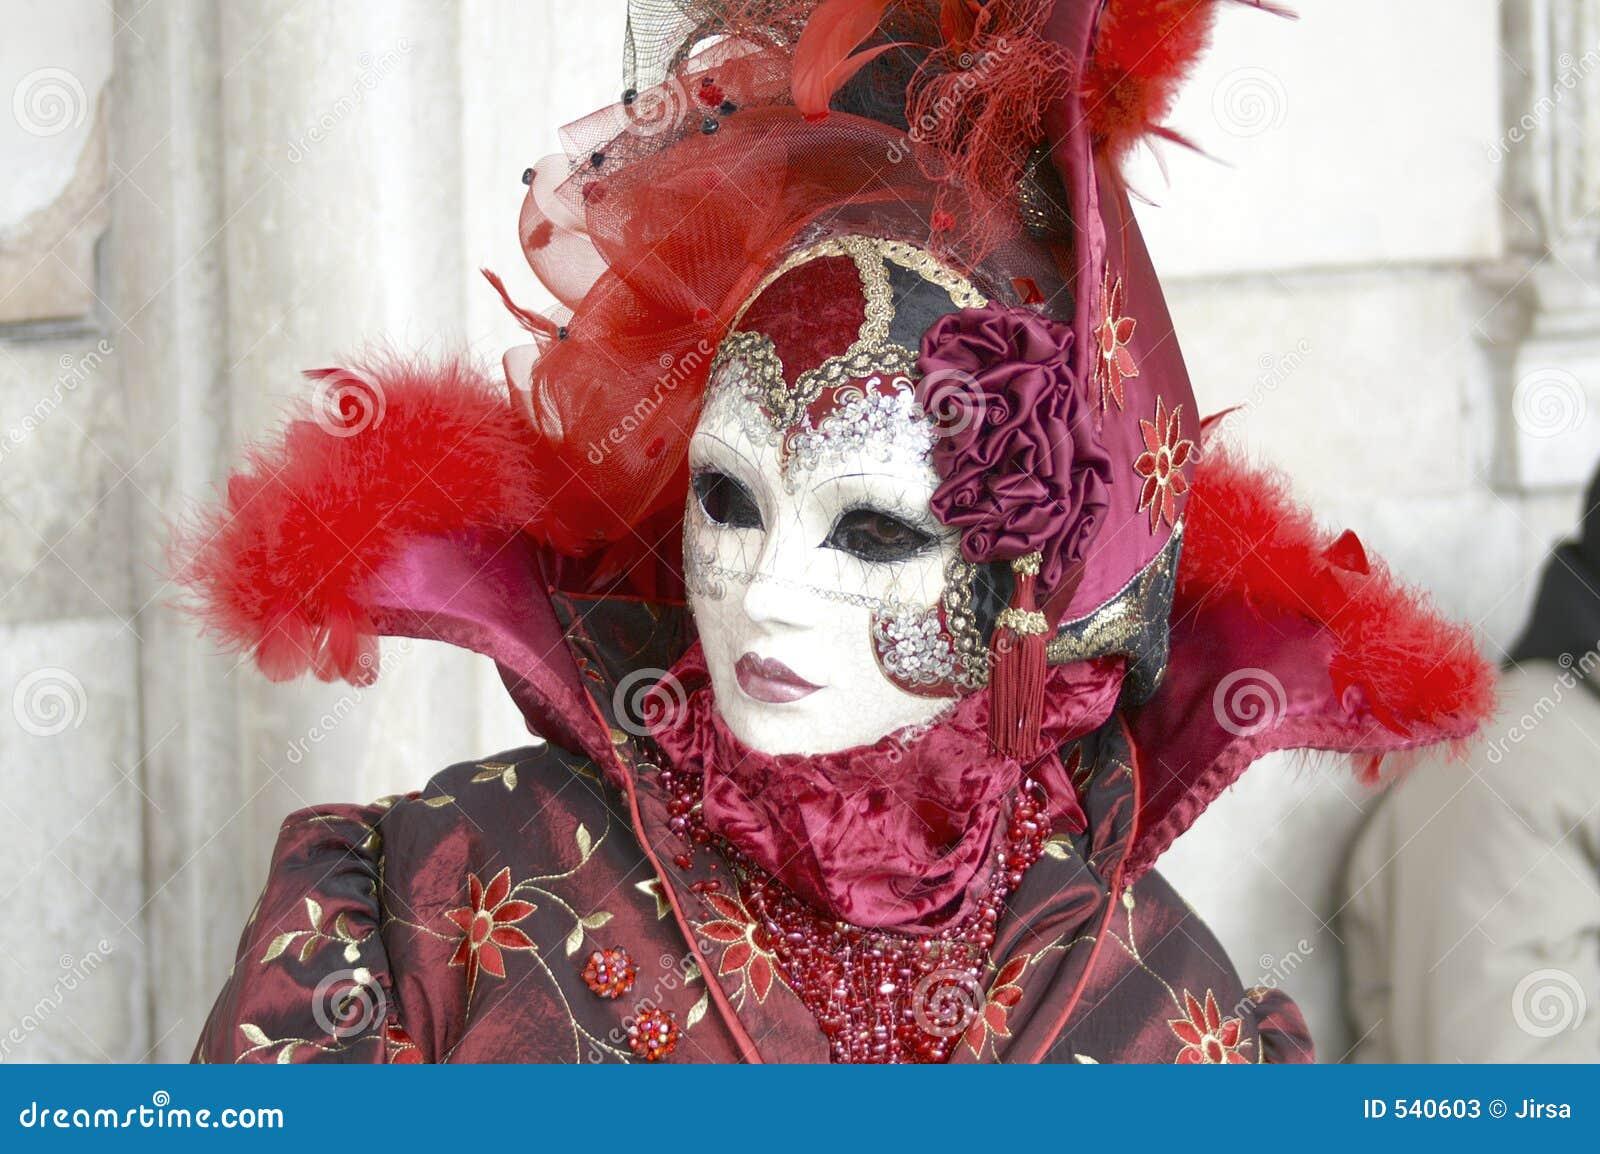 Download 屏蔽 库存图片. 图片 包括有 威尼斯, 服装, mardi, 五颜六色, 节假日, 隐藏, 狂欢节, 屏蔽 - 540603